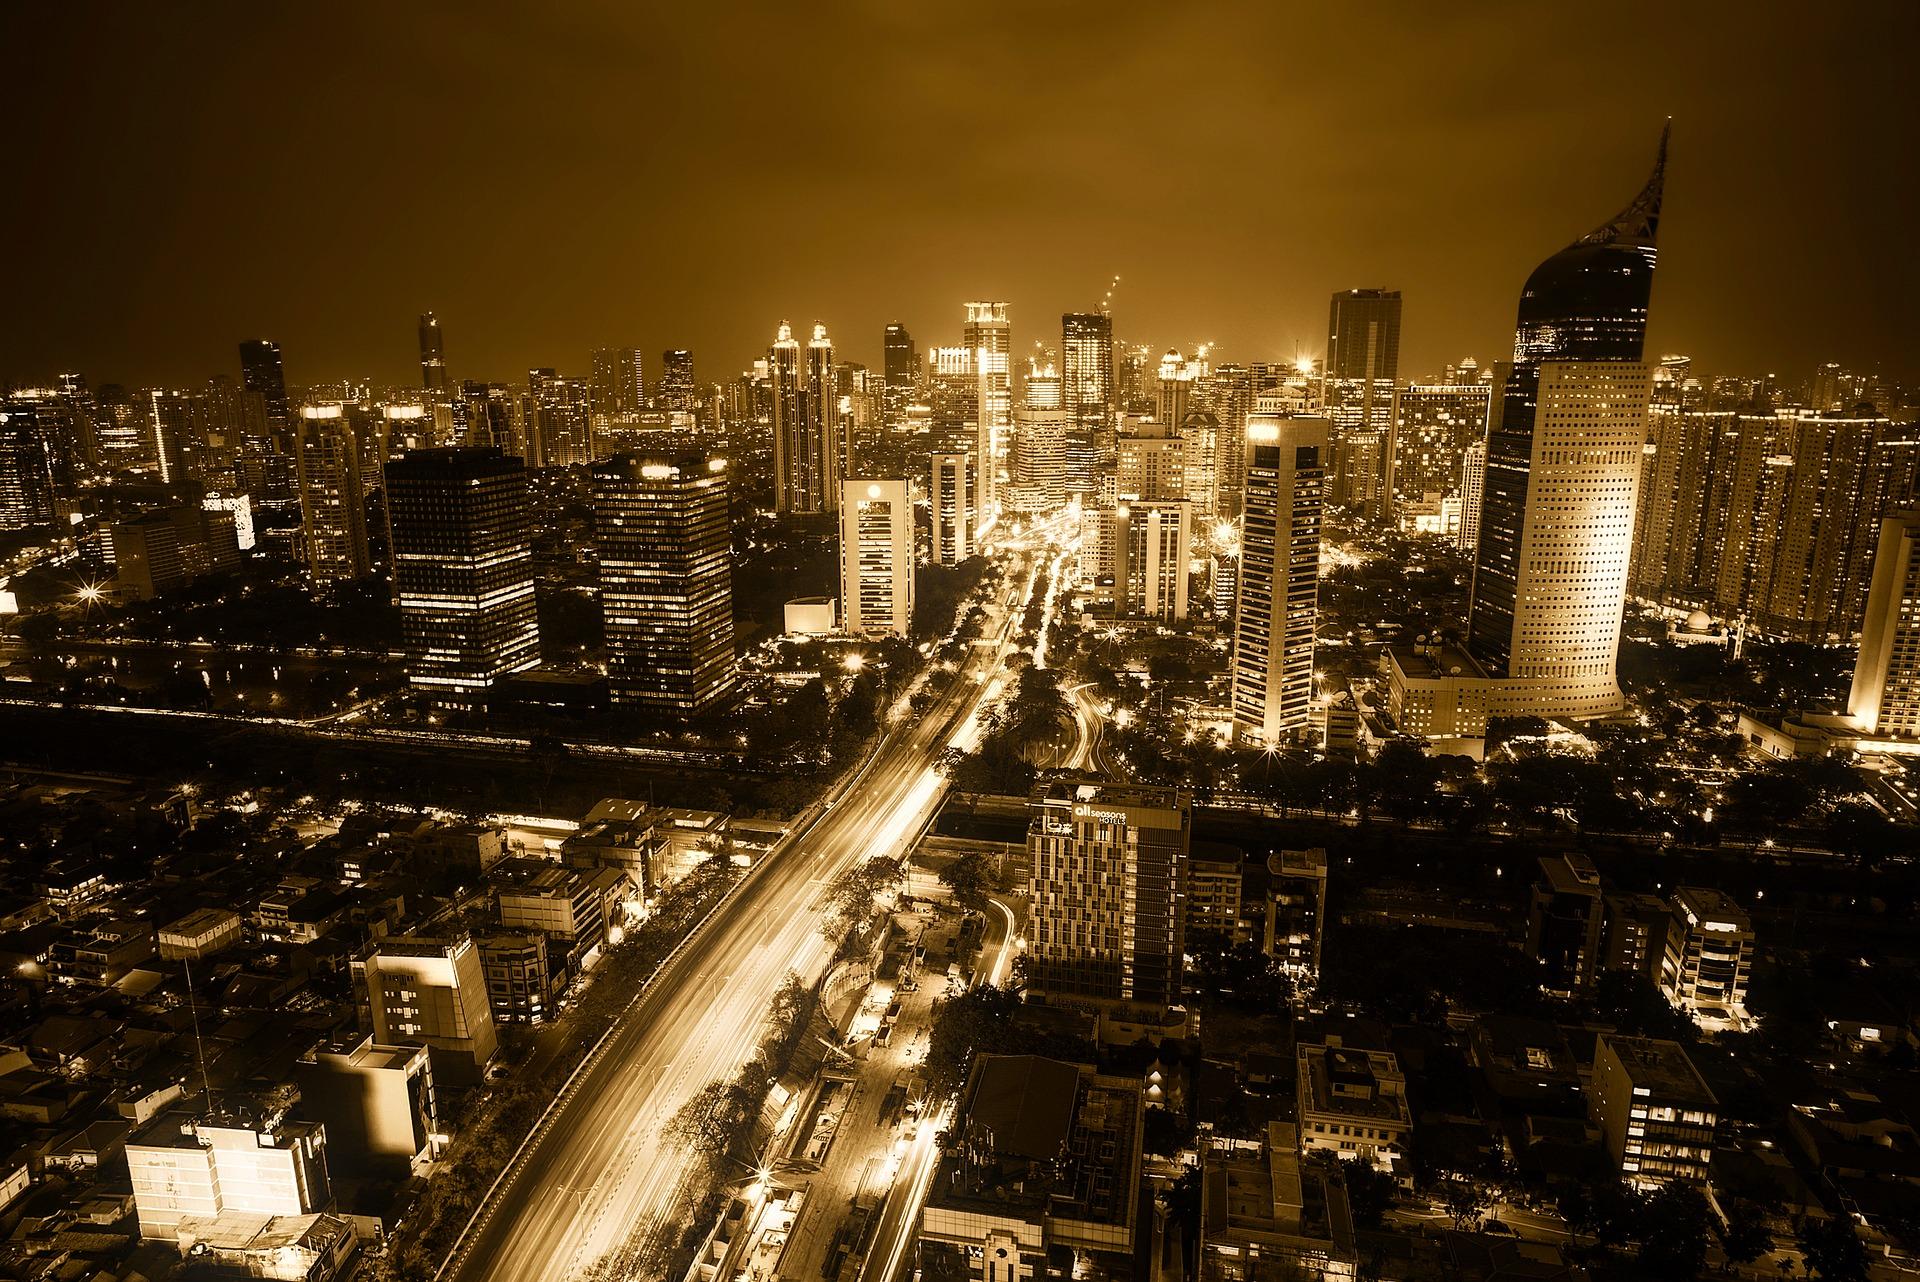 Jakarta, Indonesia at night